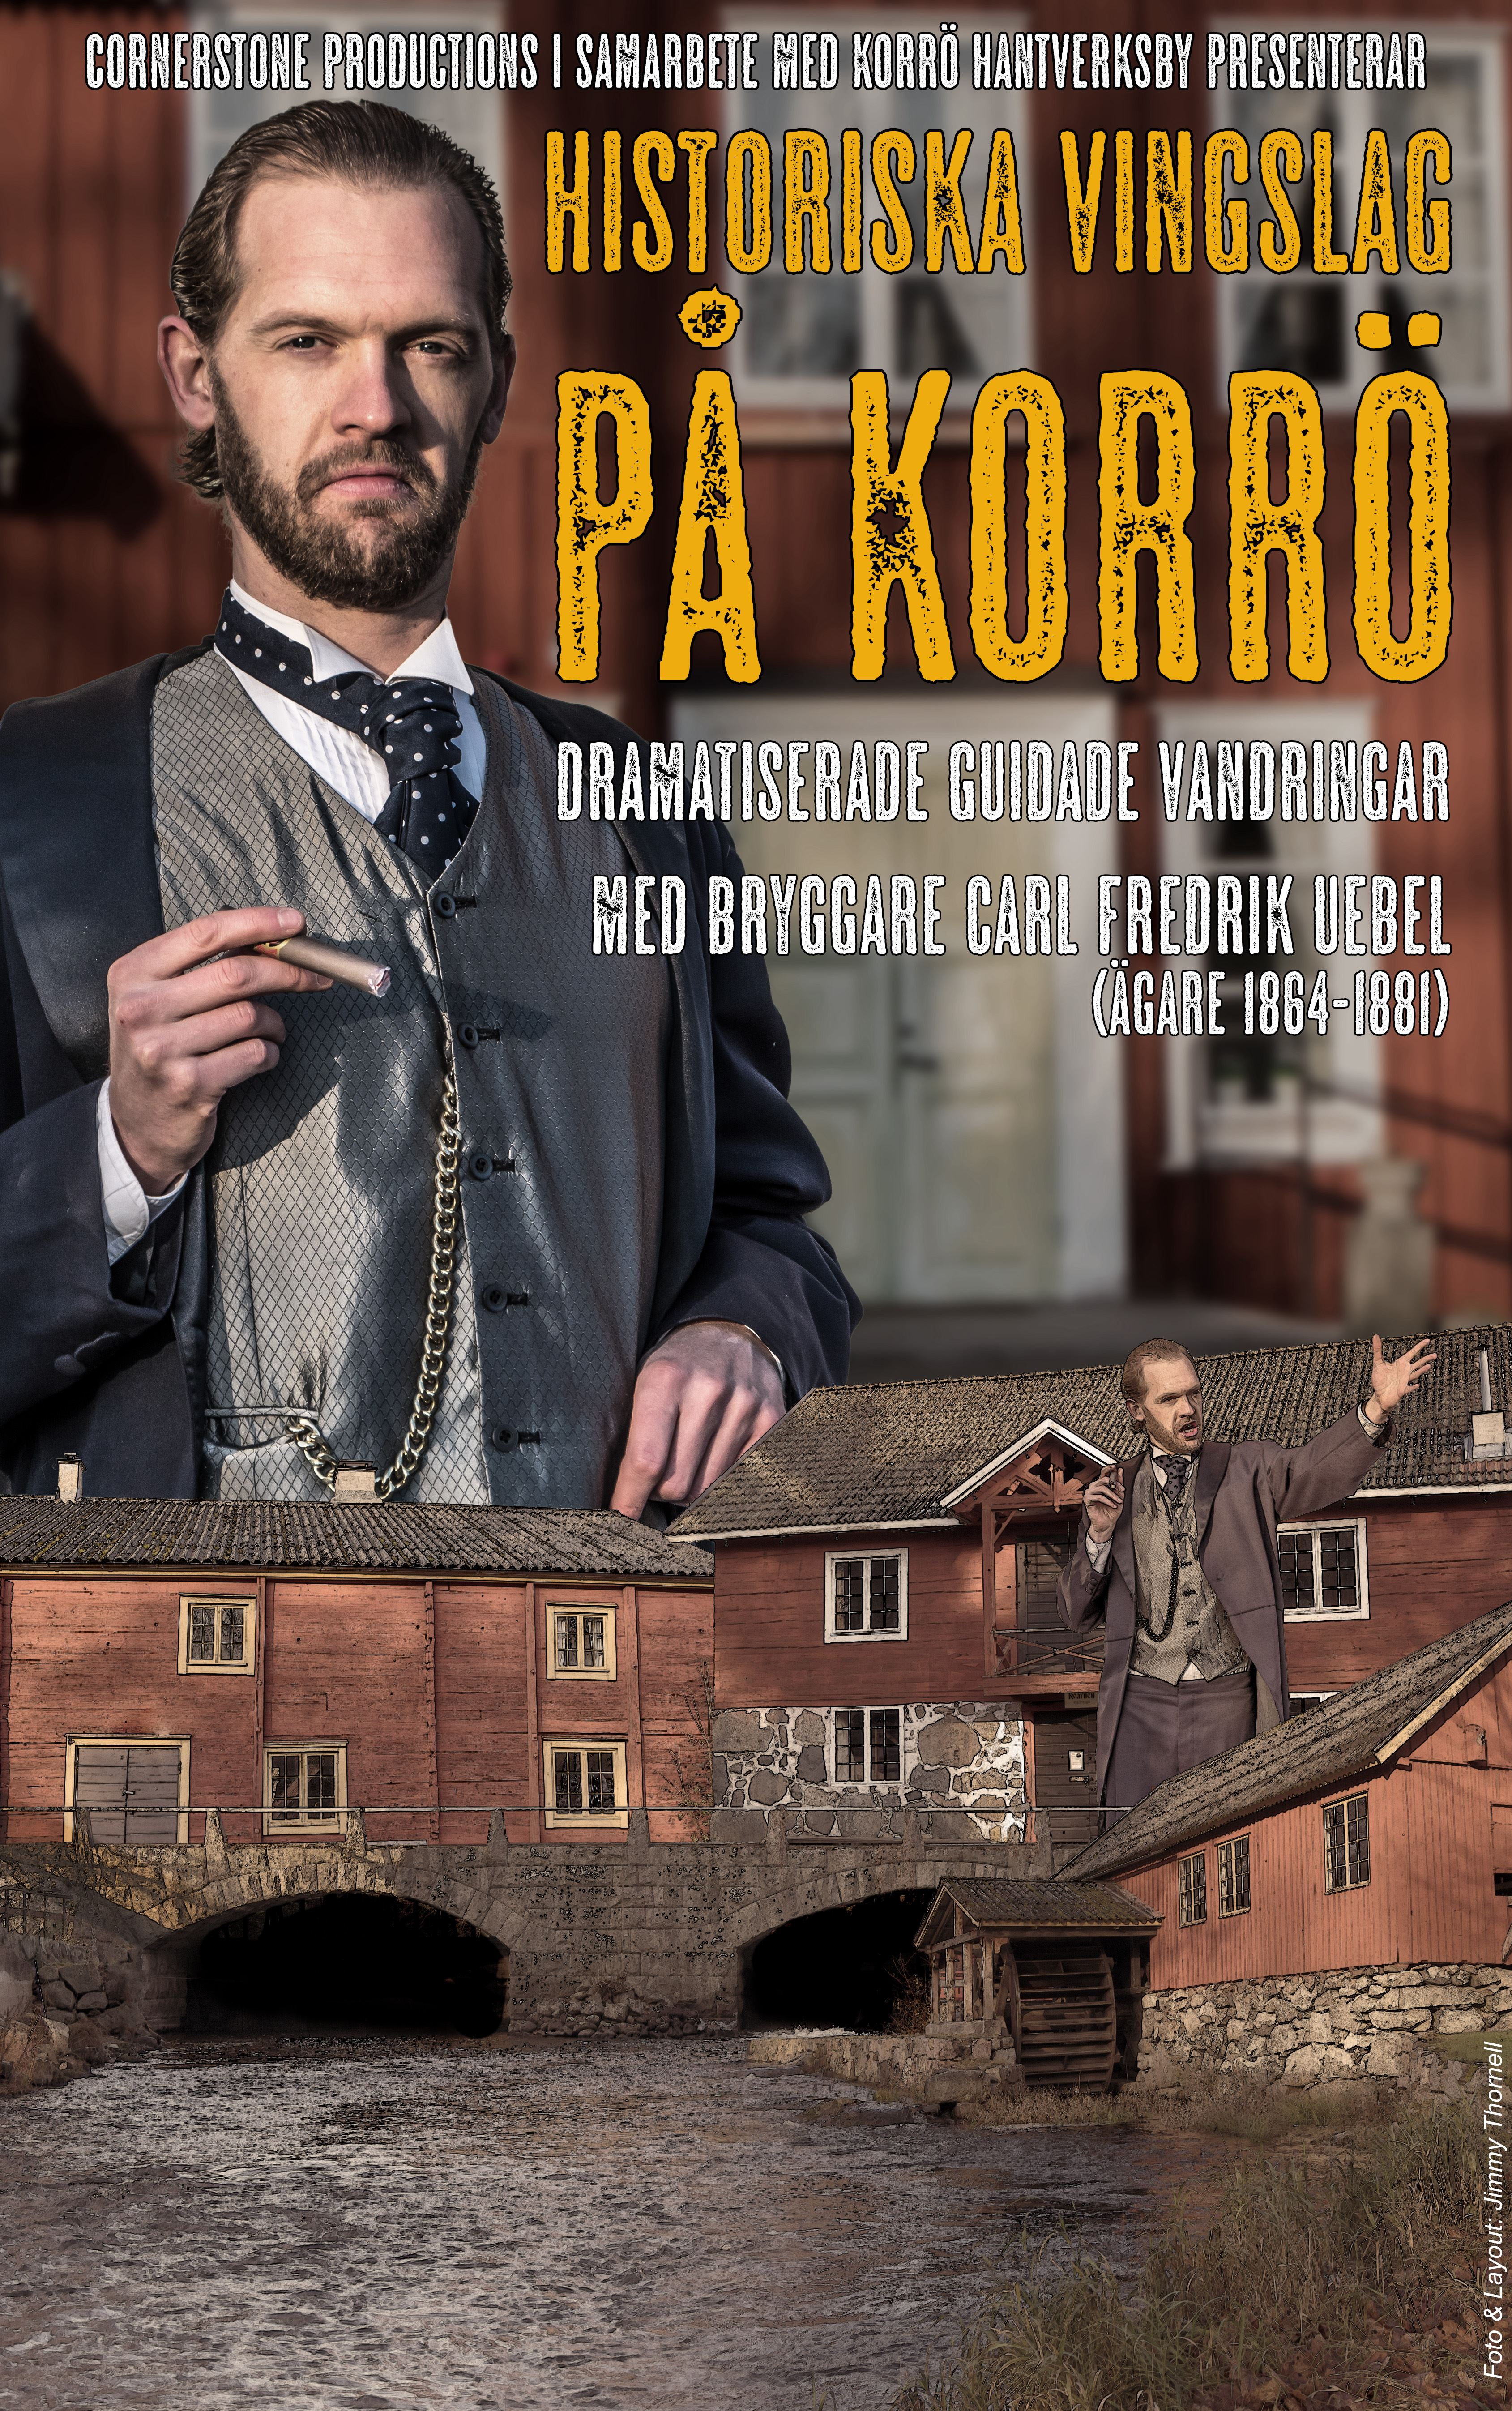 Historical wingbeats at Korrö